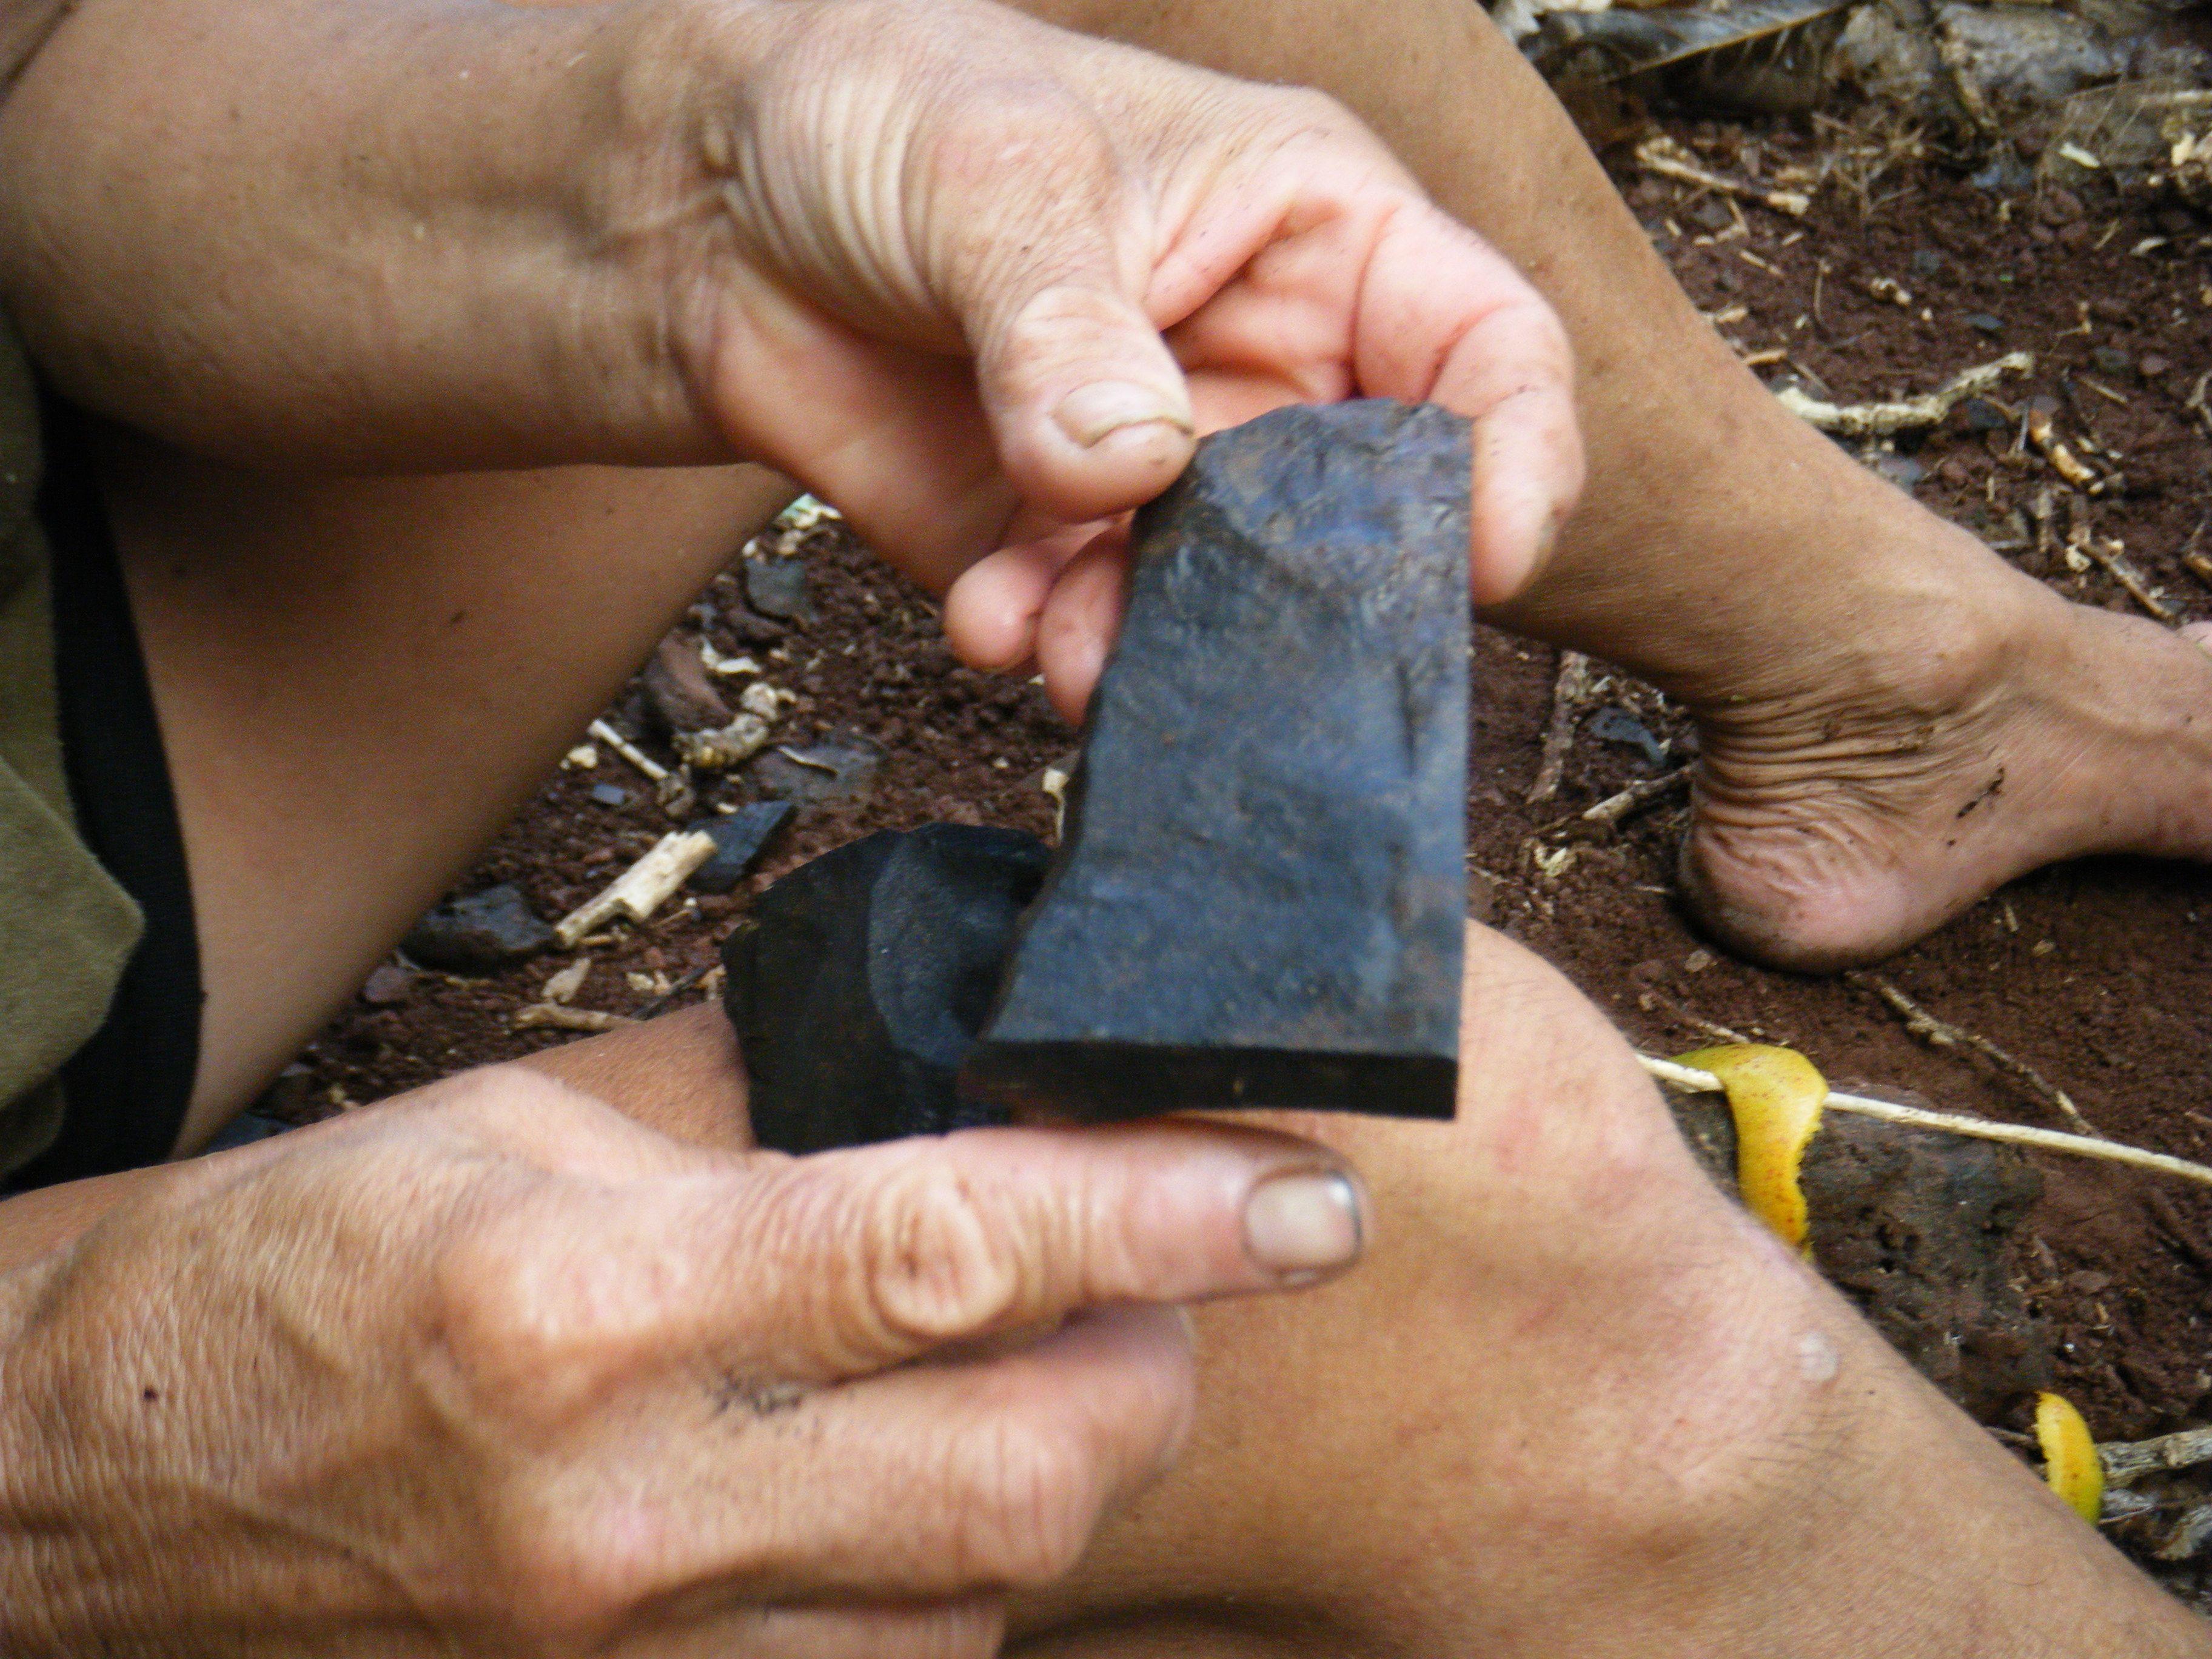 Pitcairn Island Tautama Side Brenda Christian Holds One Of The - Pitcairn island one beautiful places earth